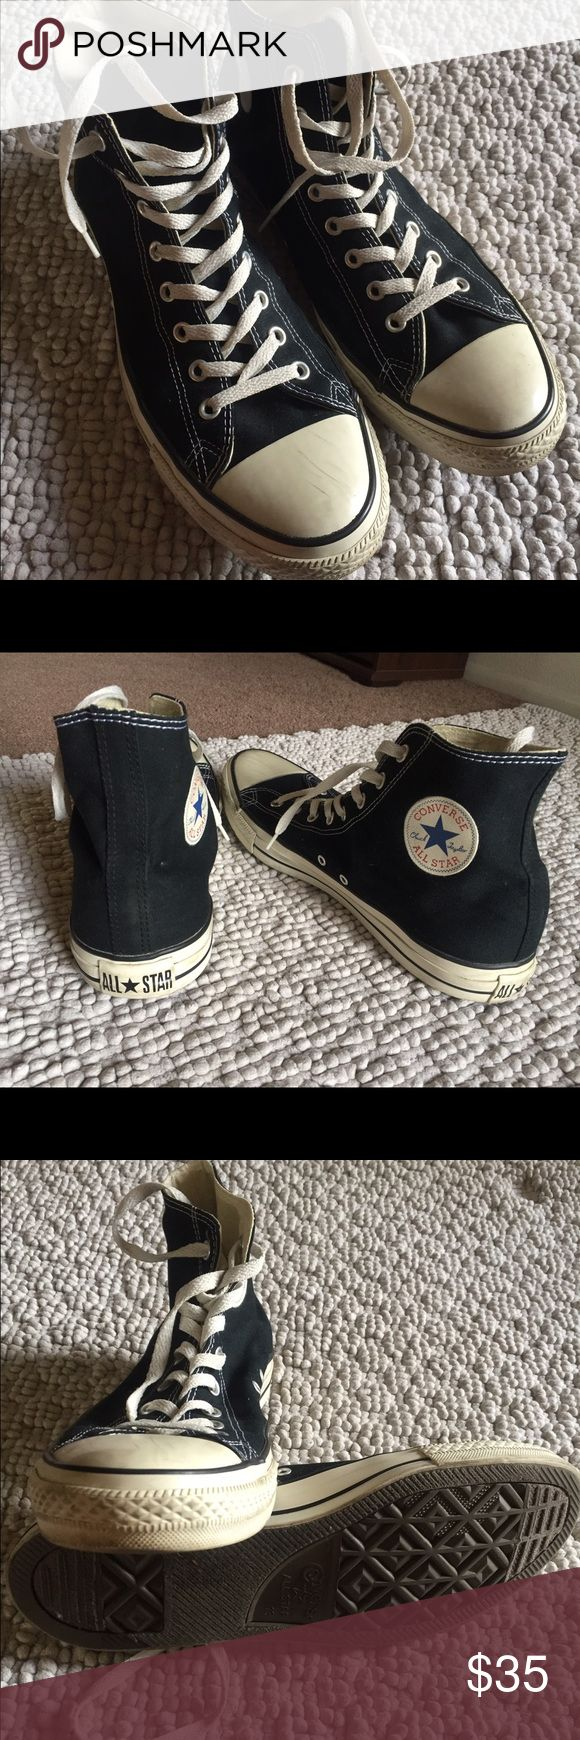 Men's Classic High-Top Chuck Taylors Size 13 Men Men's Classic High-Top Chuck Taylors Size 13 Men Converse Shoes